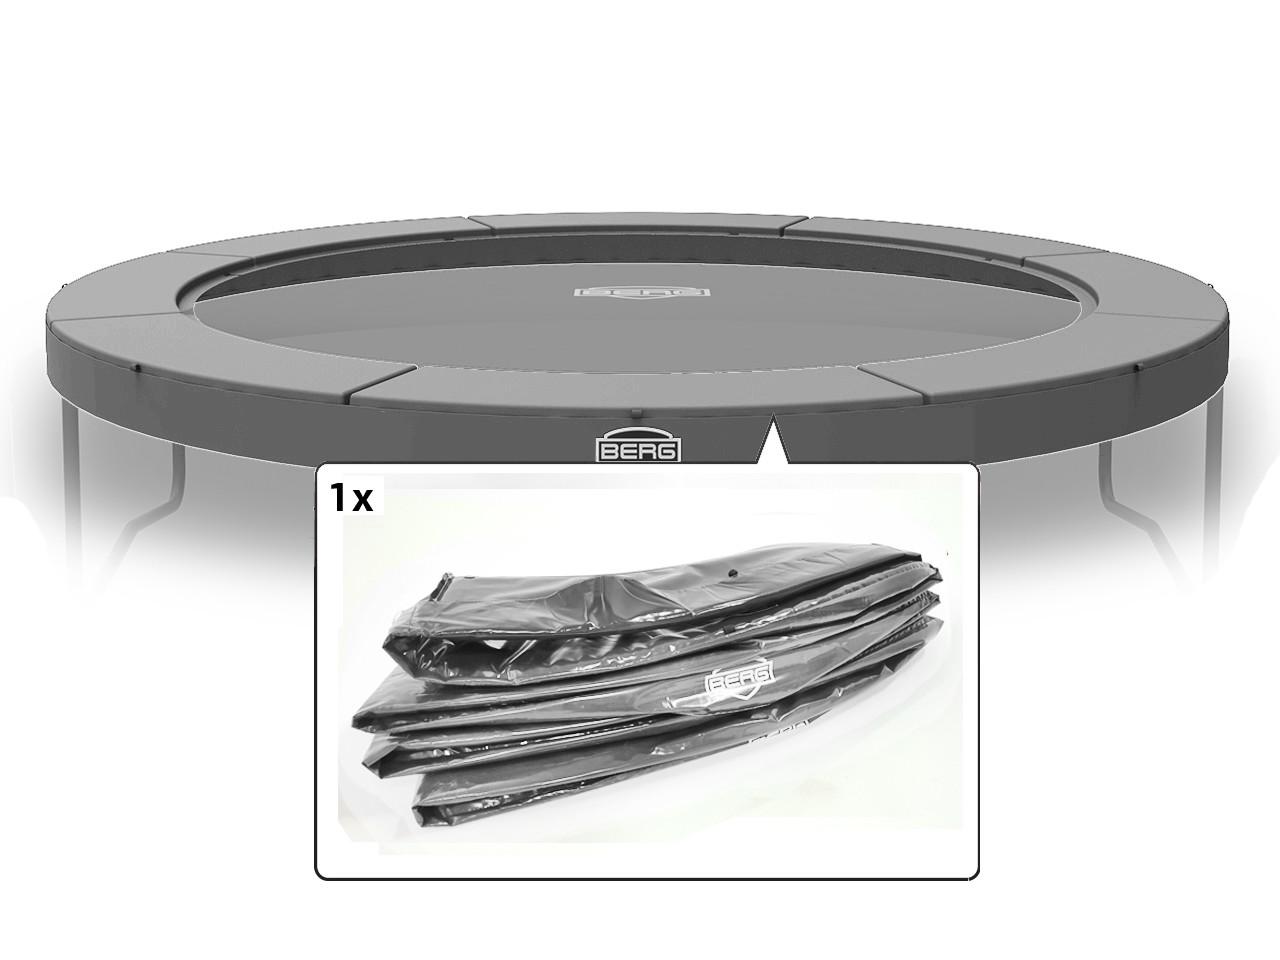 Elite - Padding grey 330 (11 ft)